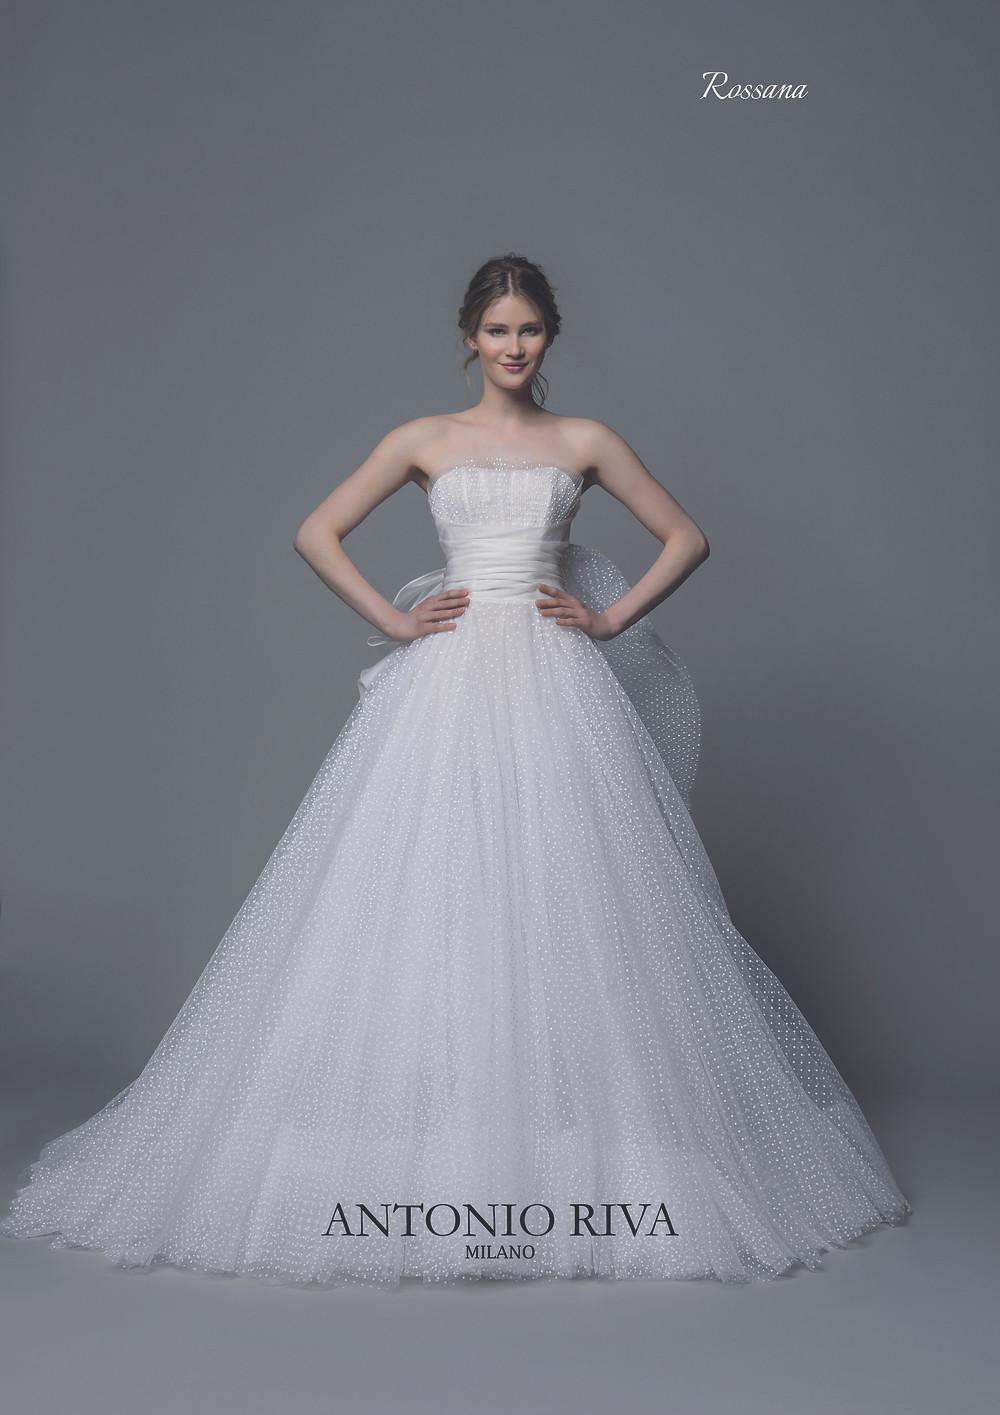 An Antonio Riva 2020 strapless polka dot tulle ball gown wedding dress